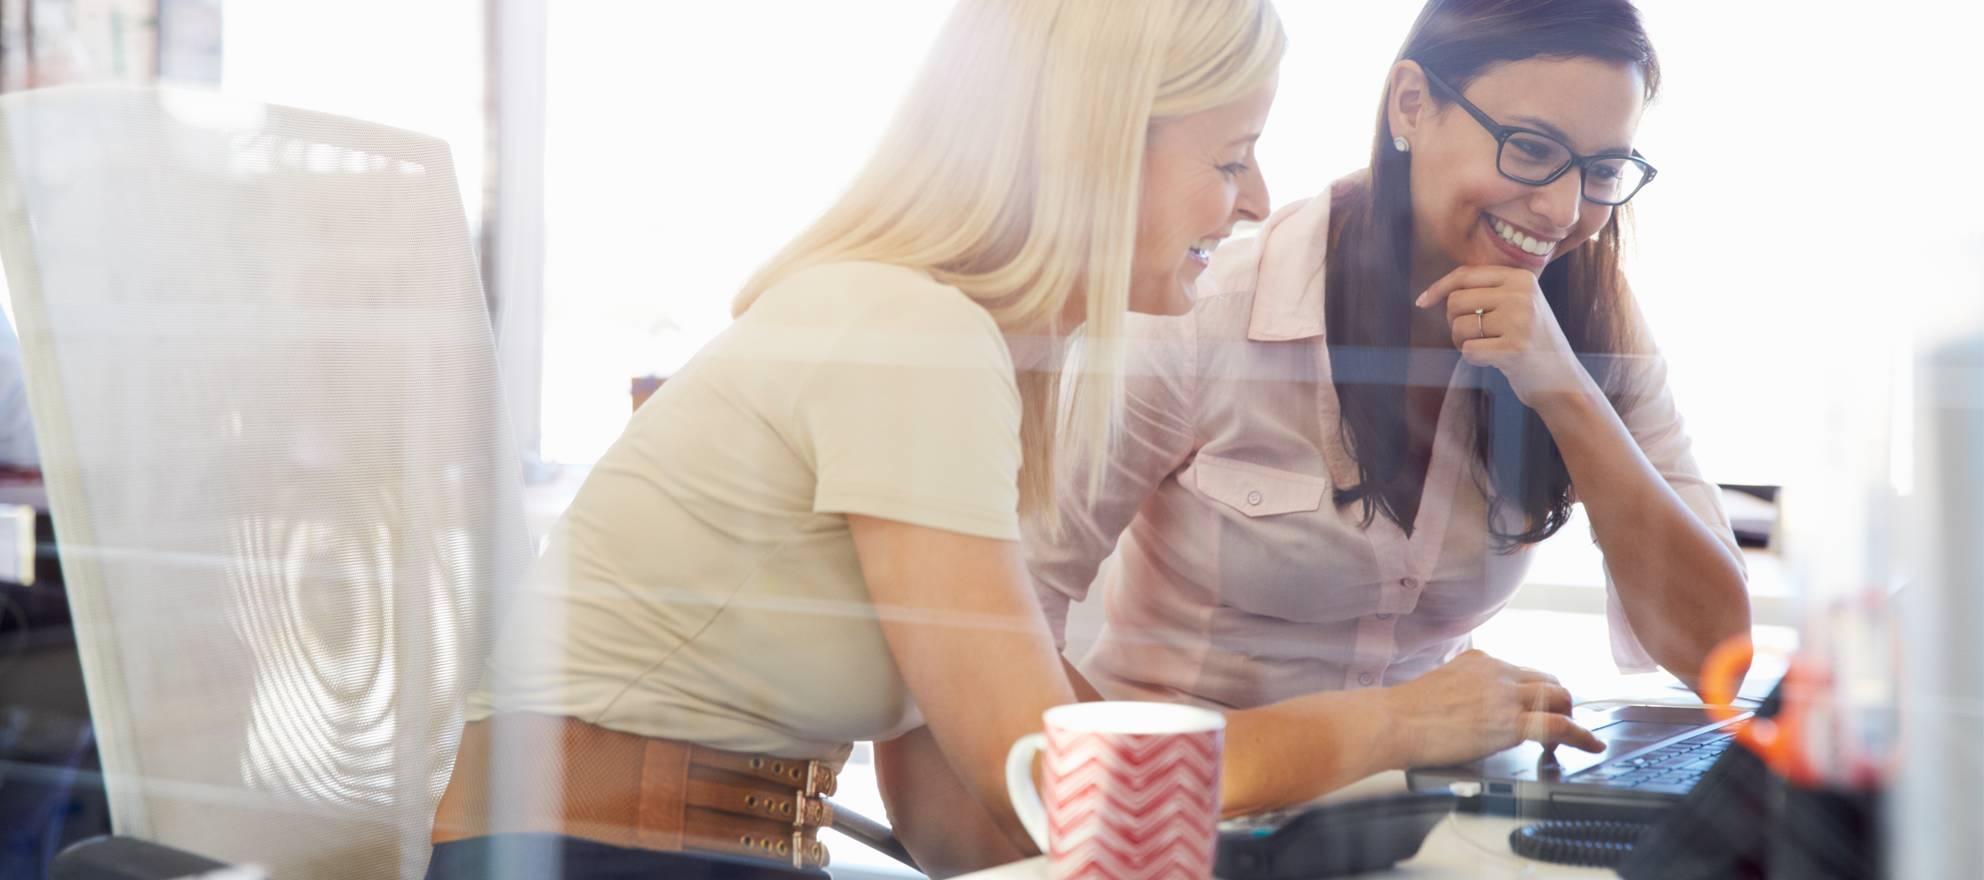 10 questions you should ask lenders regarding TRID